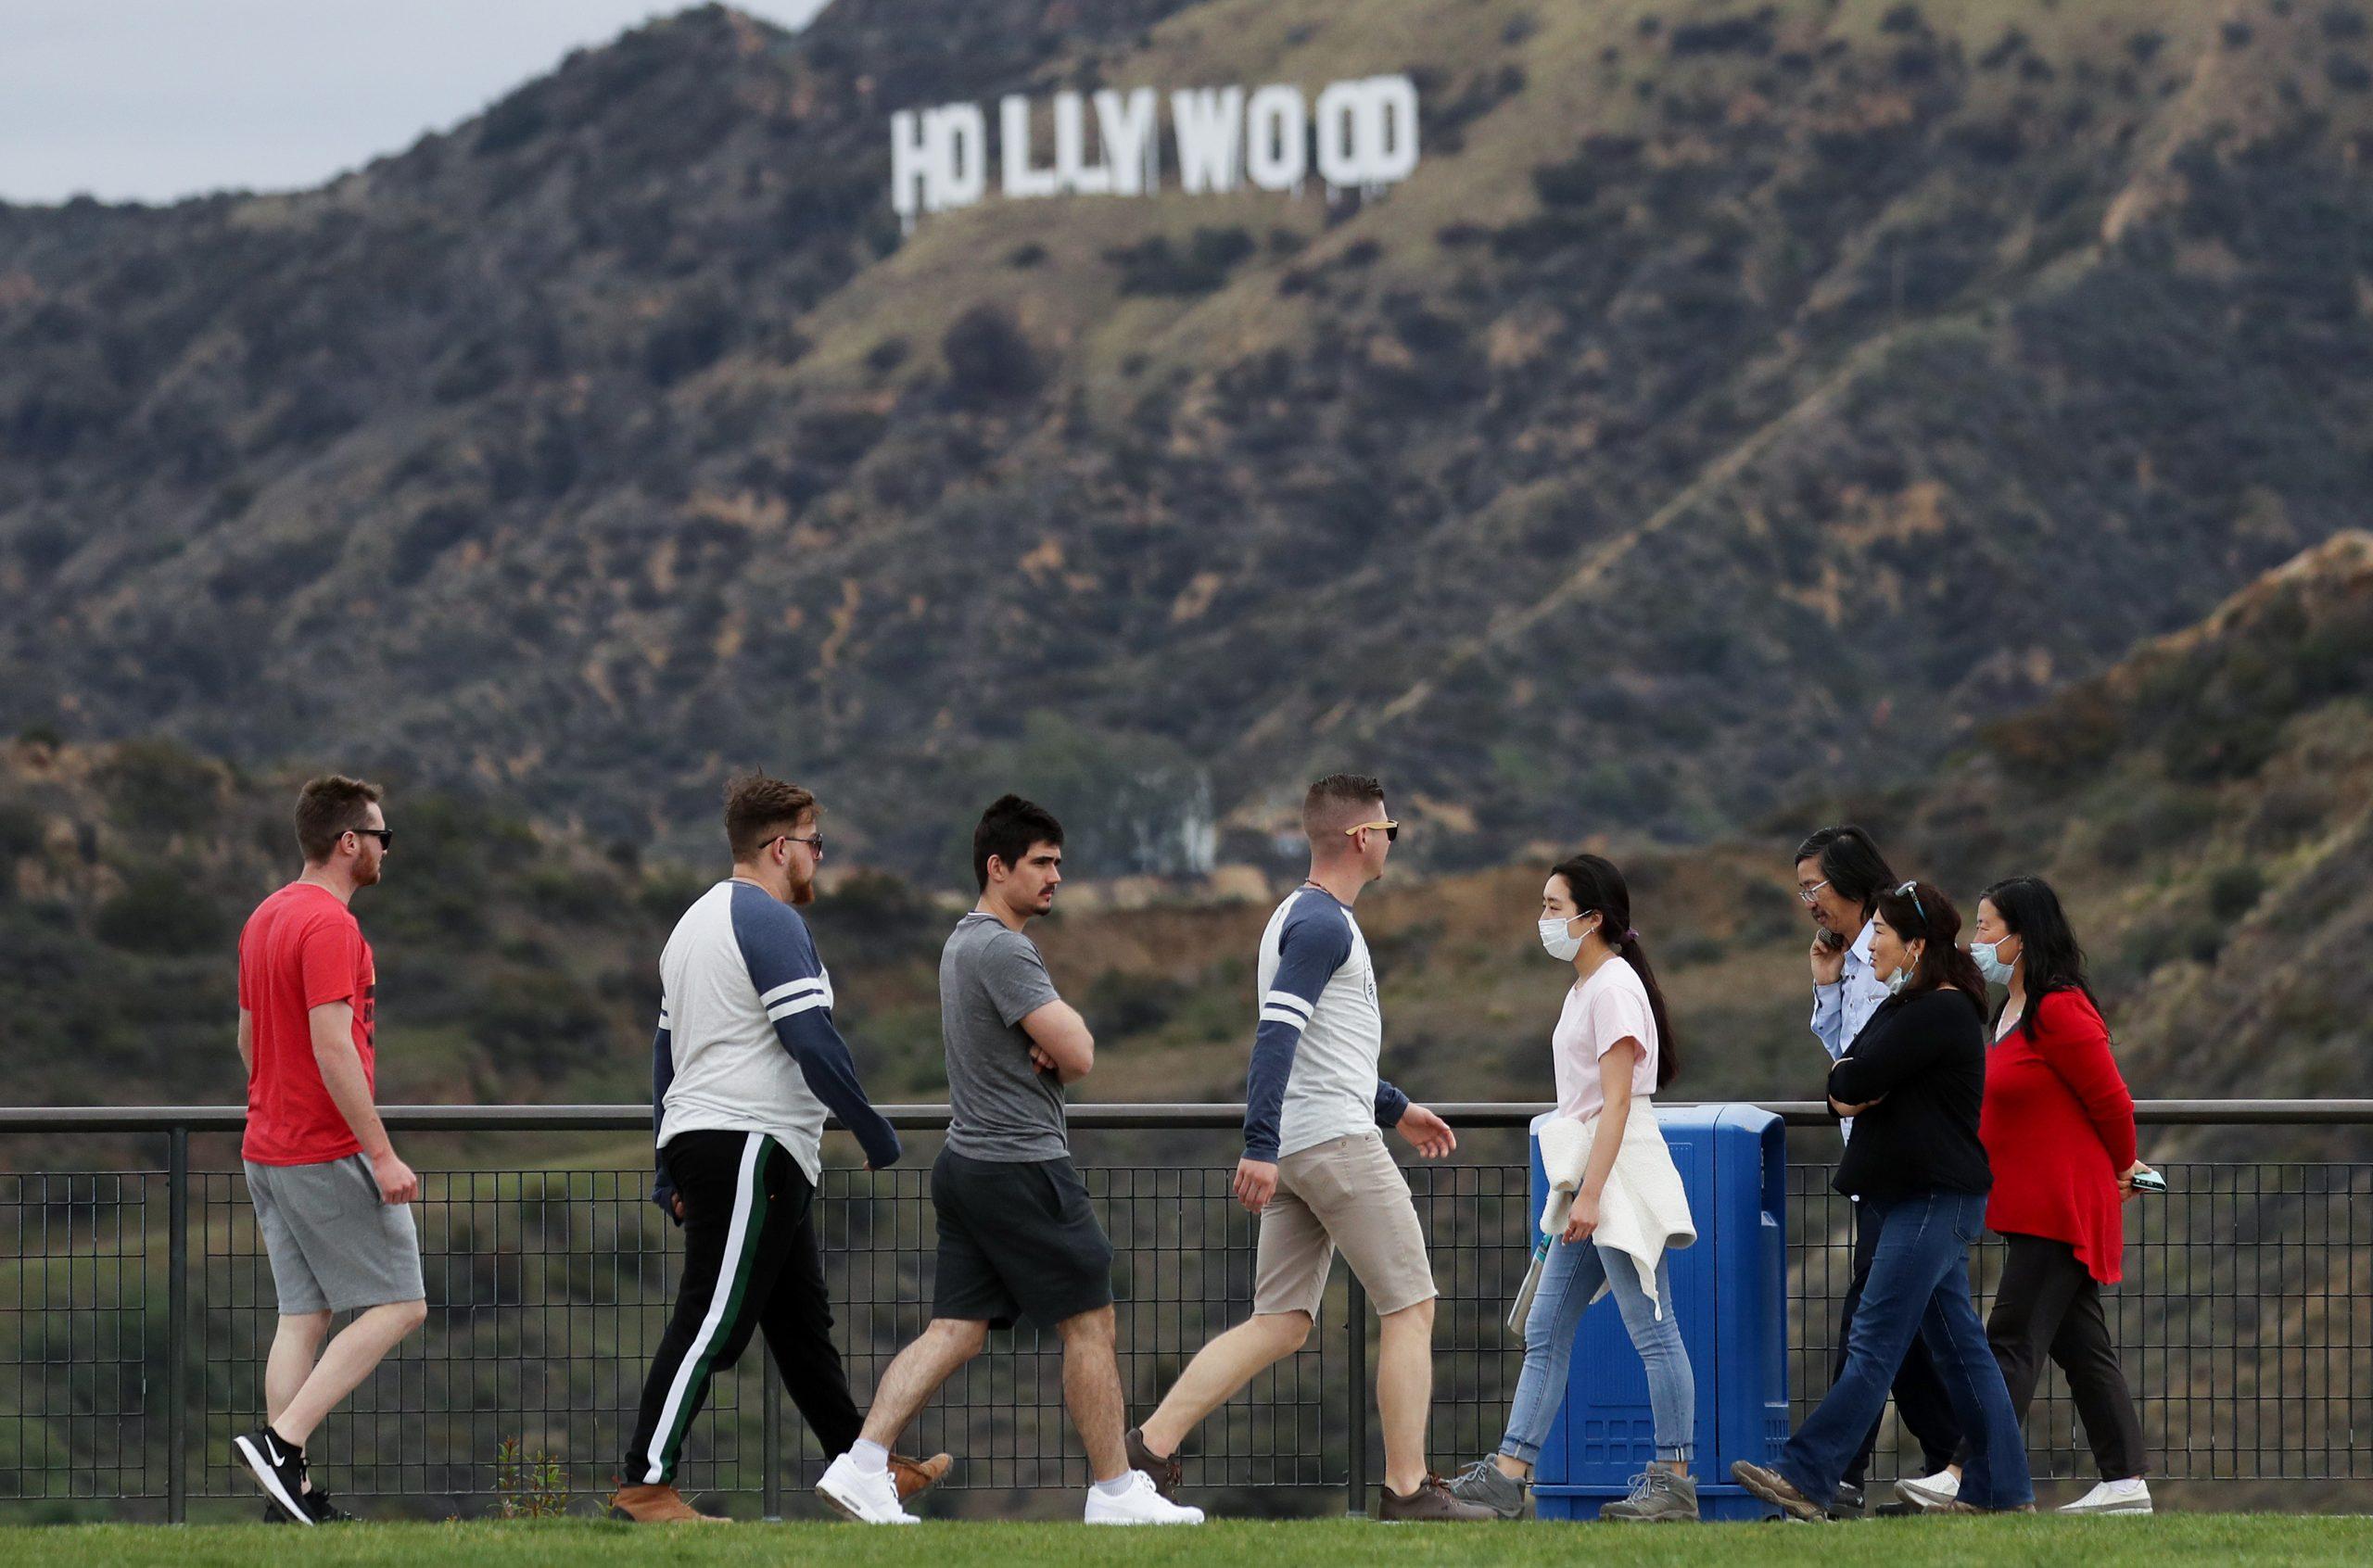 most coronavirus parks close coronavirus social distancing griffith park hollywood sign rlos angeles reopen